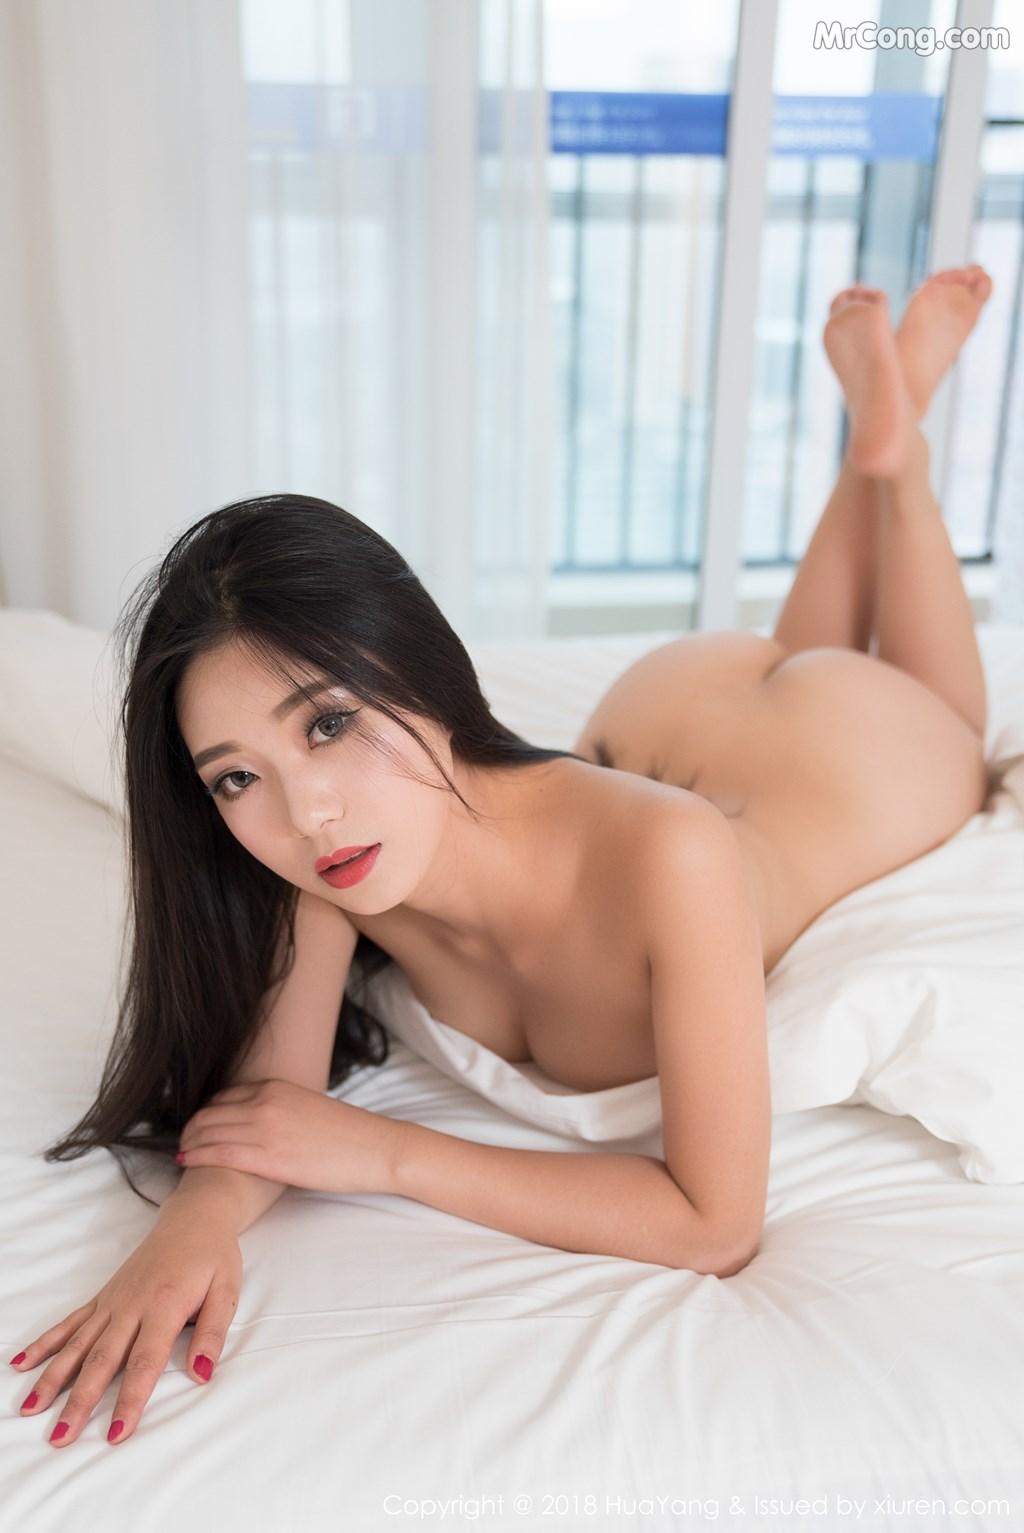 Image HuaYang-2018-02-28-Vol.033-KiKi-MrCong.com-031 in post HuaYang 2018-02-28 Vol.033: Người mẫu 宋-KiKi (42 ảnh)